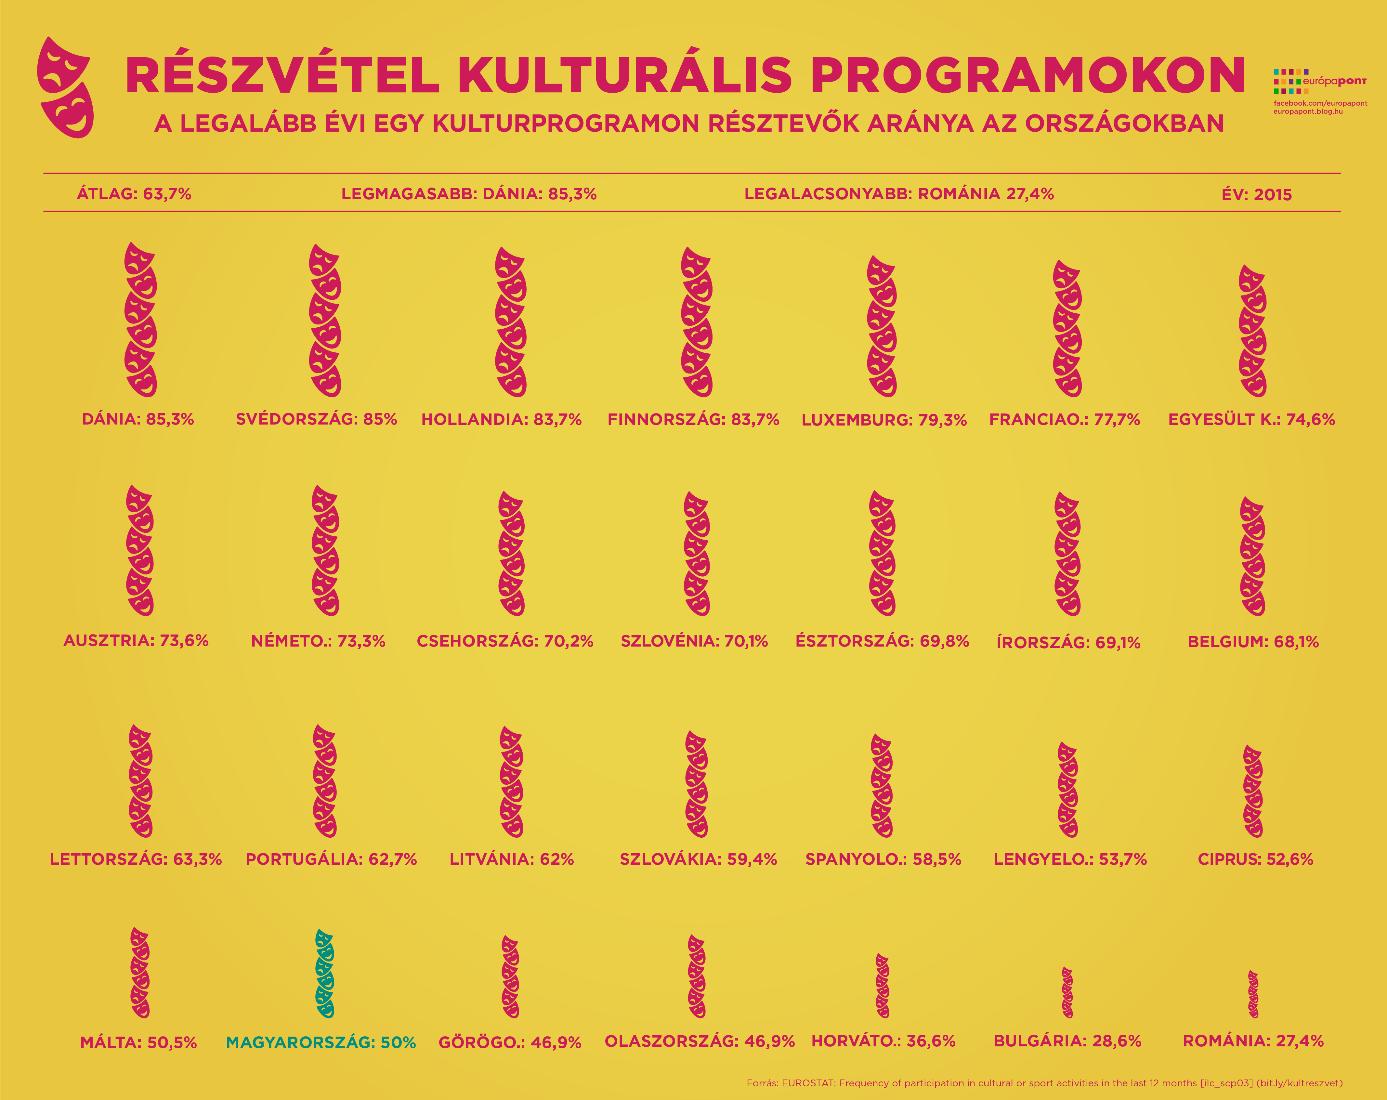 kultf2.png